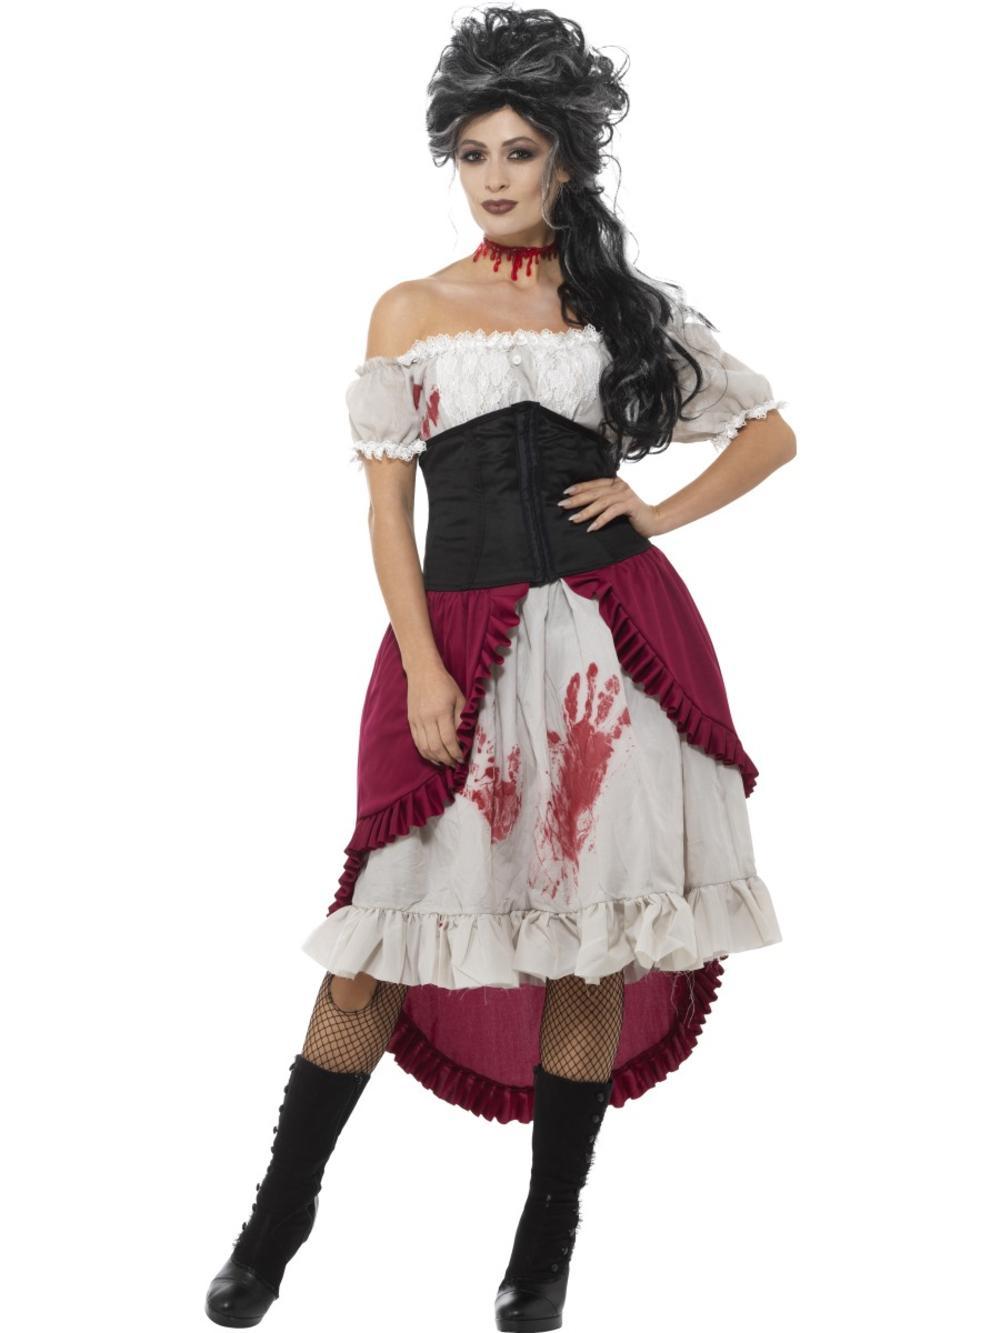 Victorian Slasher Victim Ladies Fancy Dress Jack Ripper Halloween Adults Costume